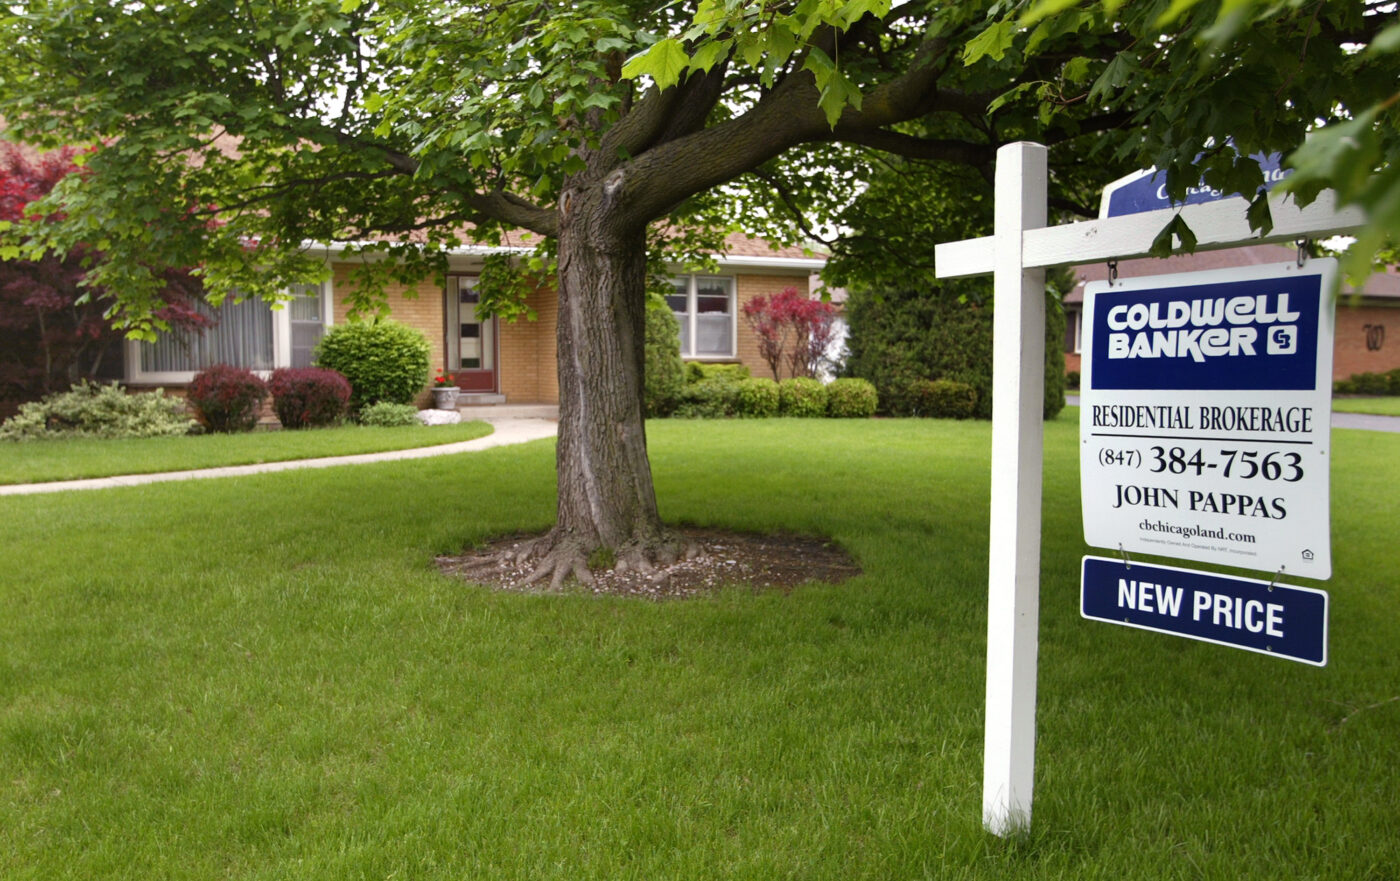 Homeownership gap between white and Black Americans is widening